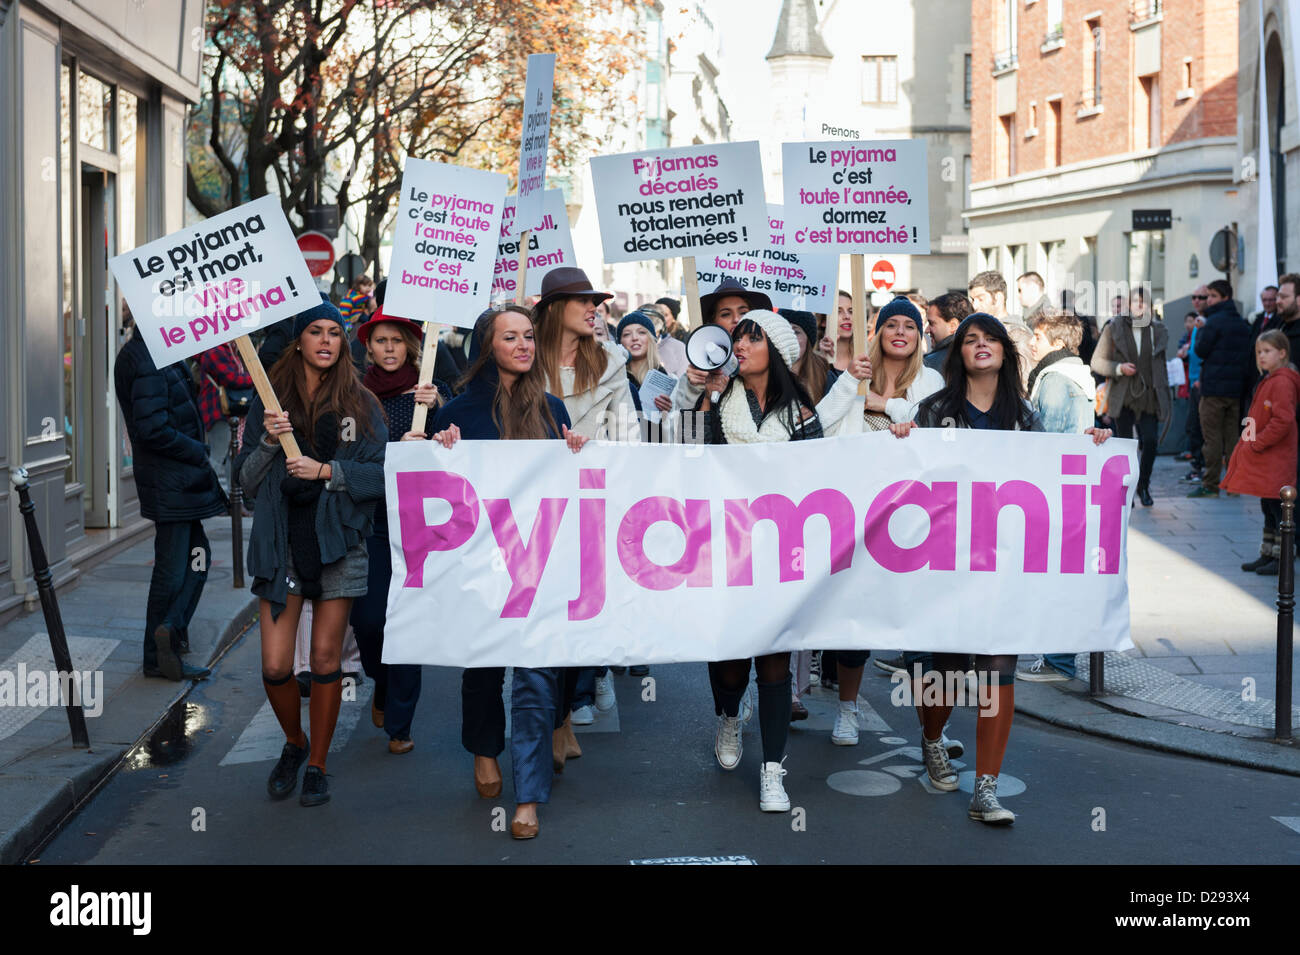 Pyjamanif - PR event in the Marais (Paris) for the Princess Tam Tam brand - styled as street protest - Stock Image